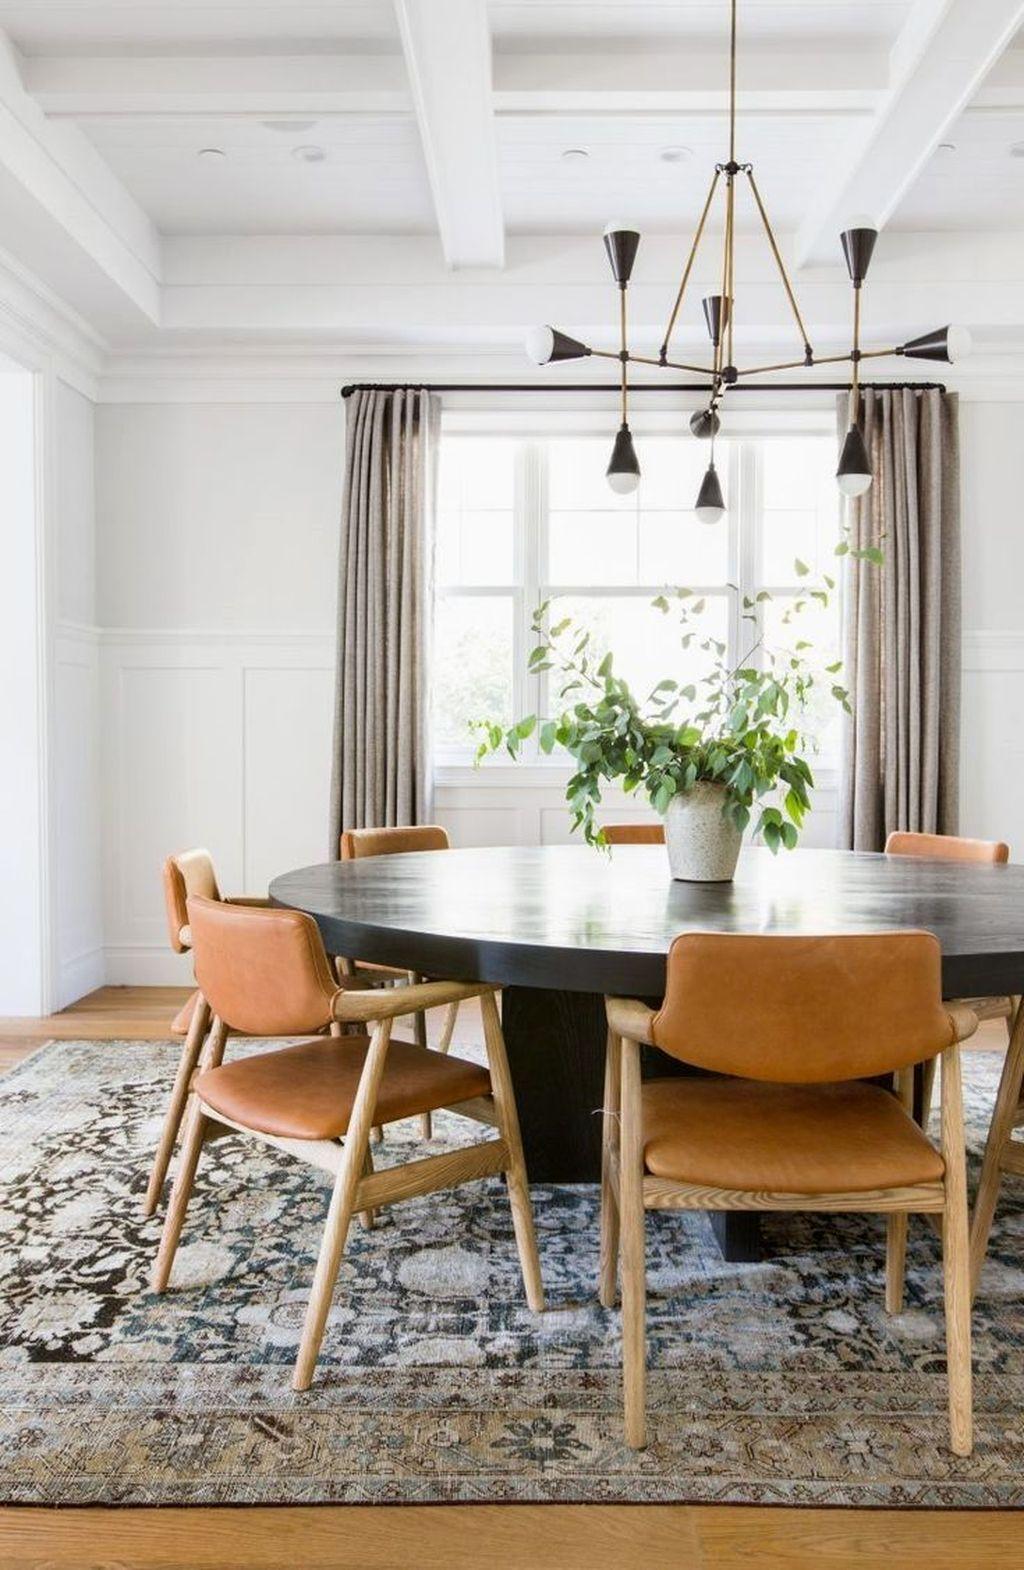 Admirable Dining Room Design Ideas 28